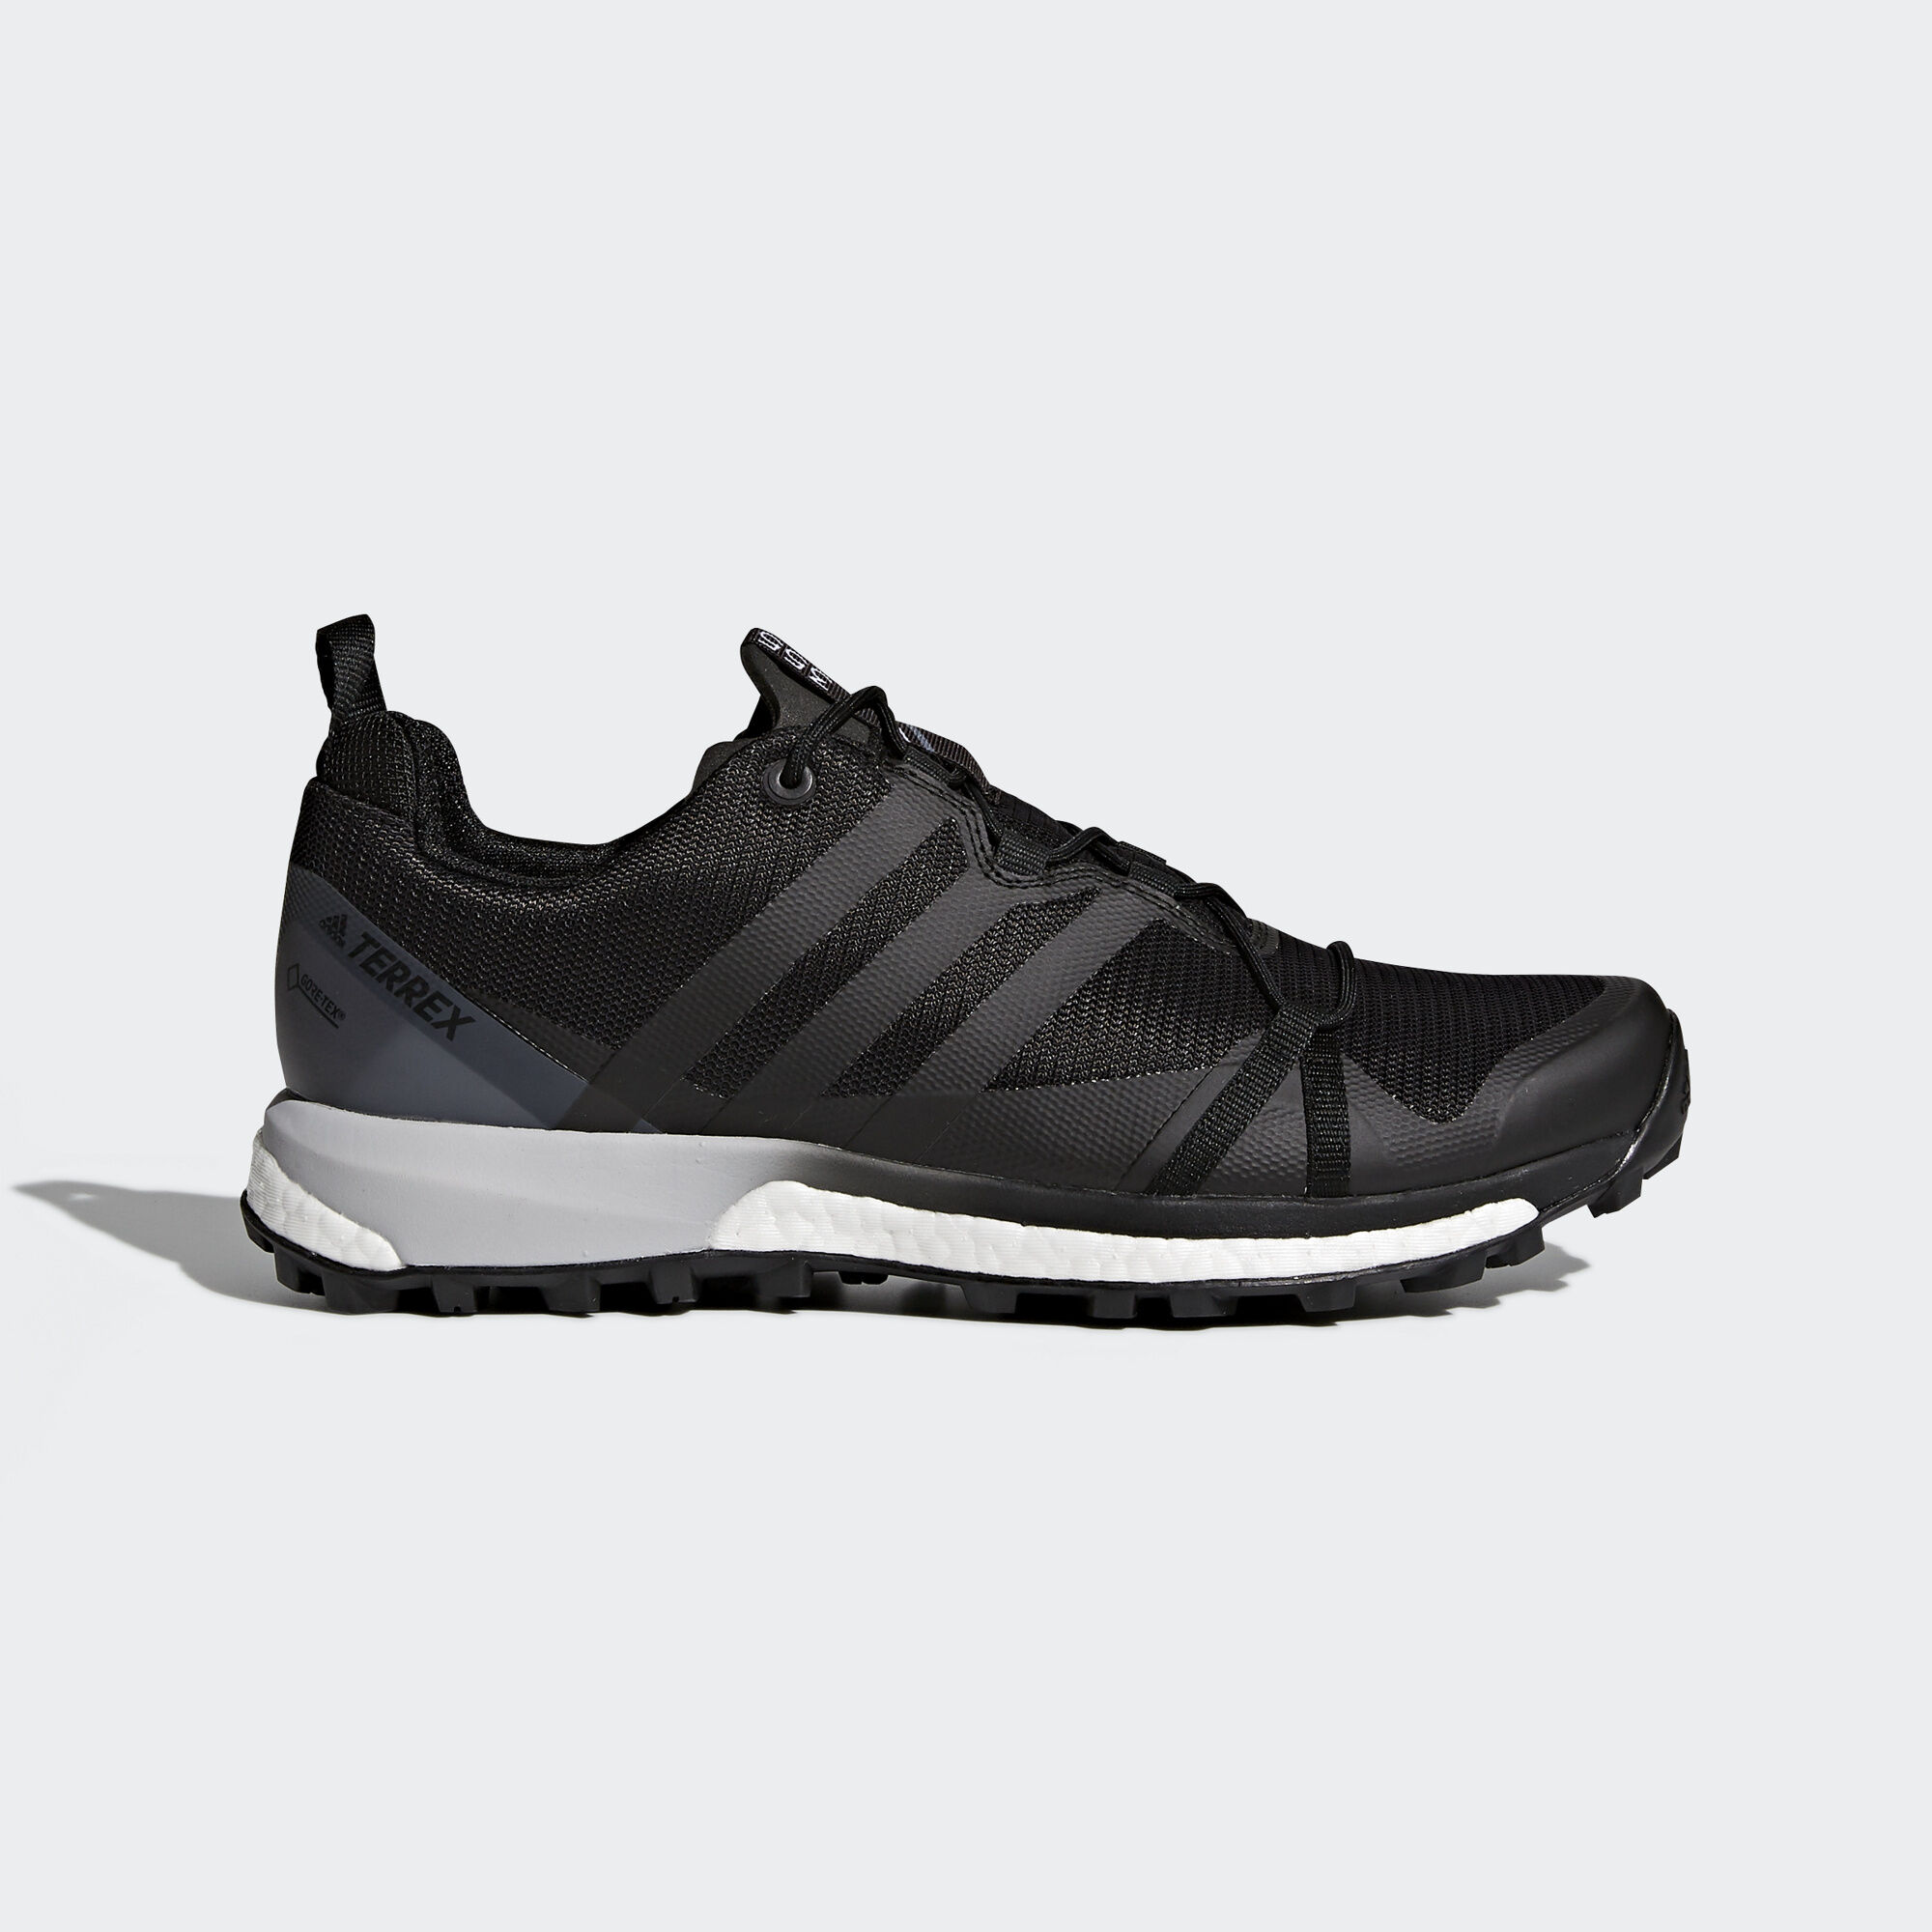 cc45762c83ad ... closeout adidas terrex agravic gtx shoes core black core black running  white ftw bb0953 ebb0f 183ad